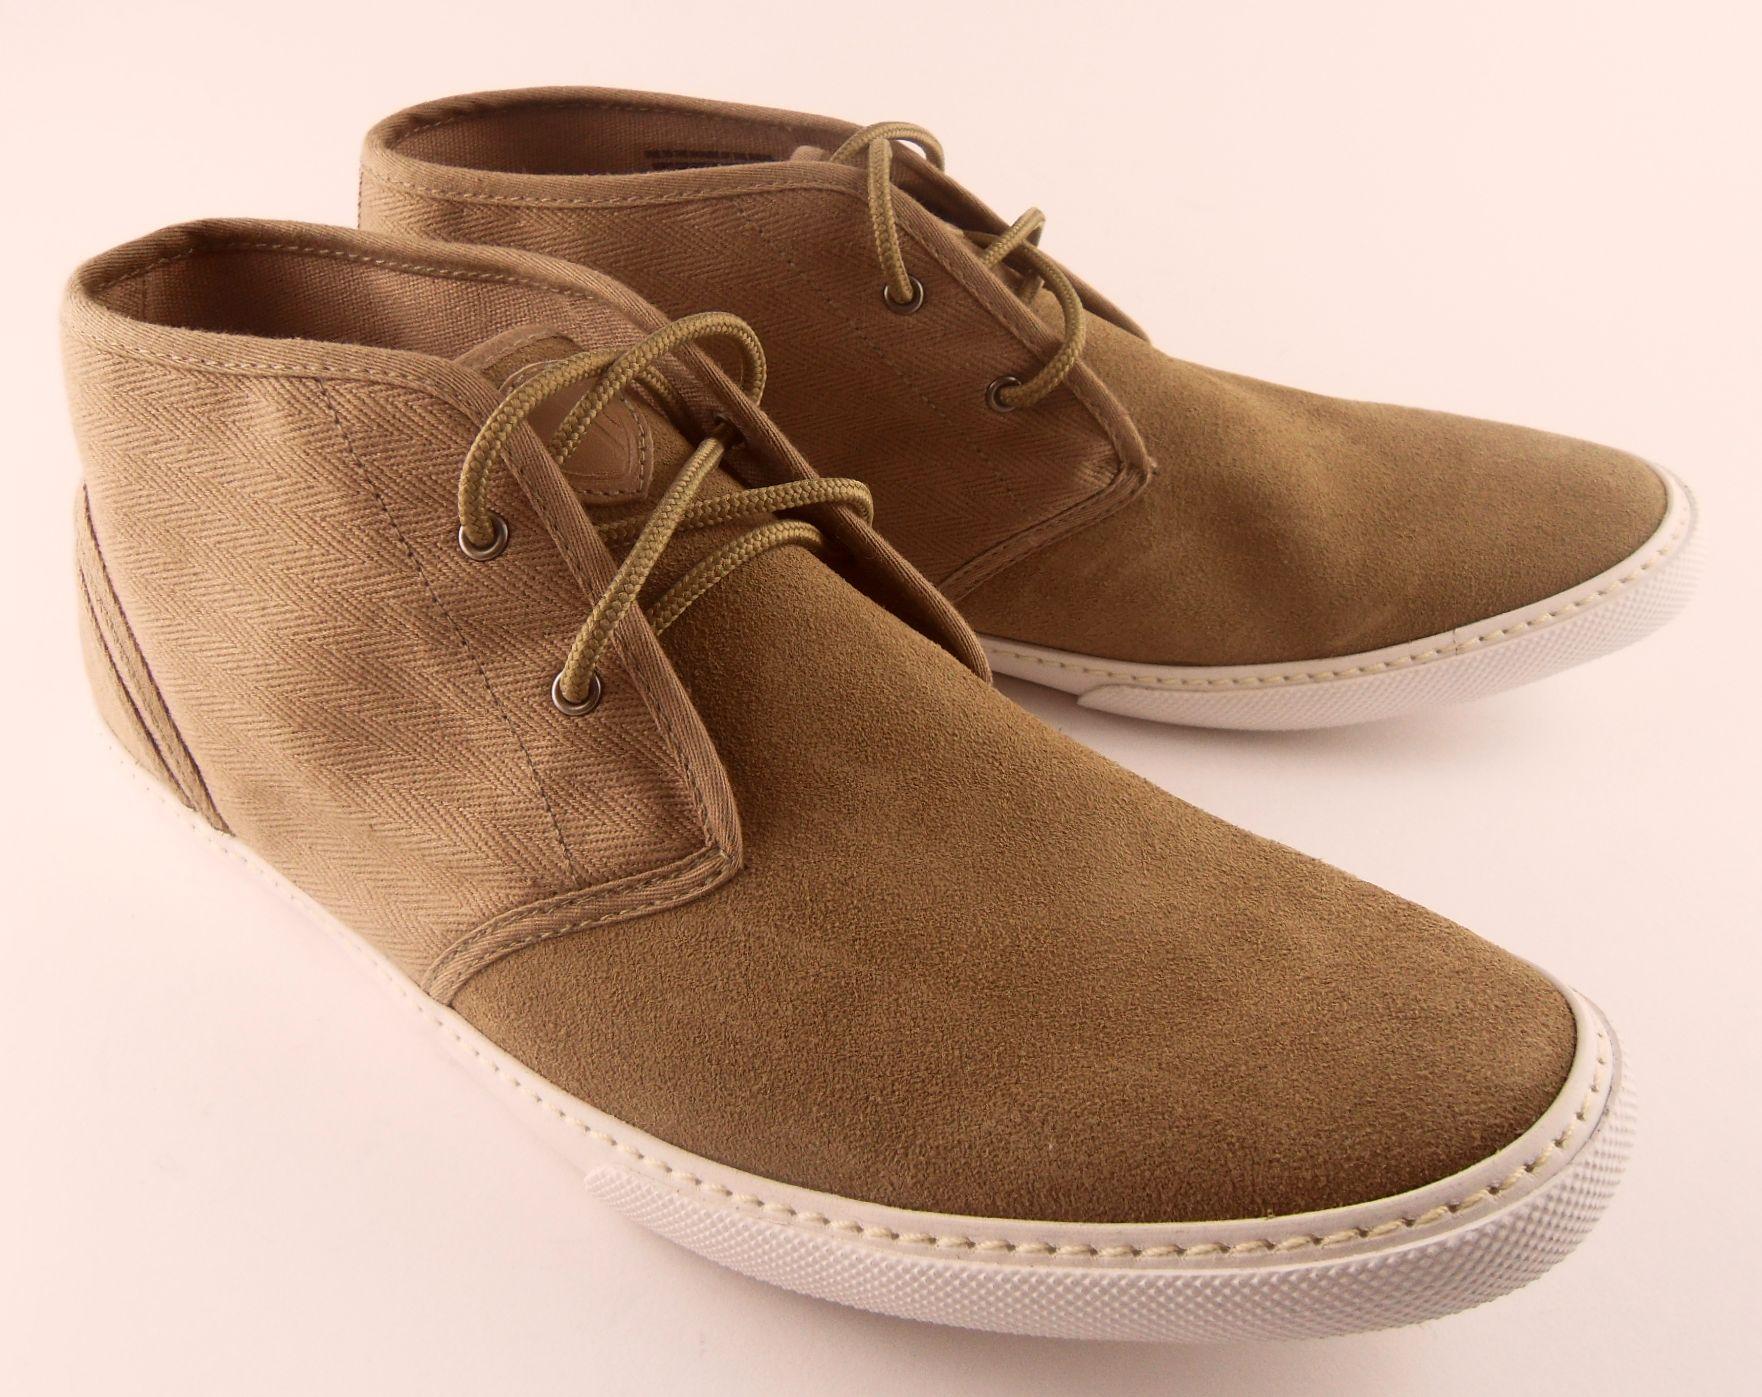 Mens Ben Sherman Suede Canvas Desert Chukka Boots 7 11 EBay